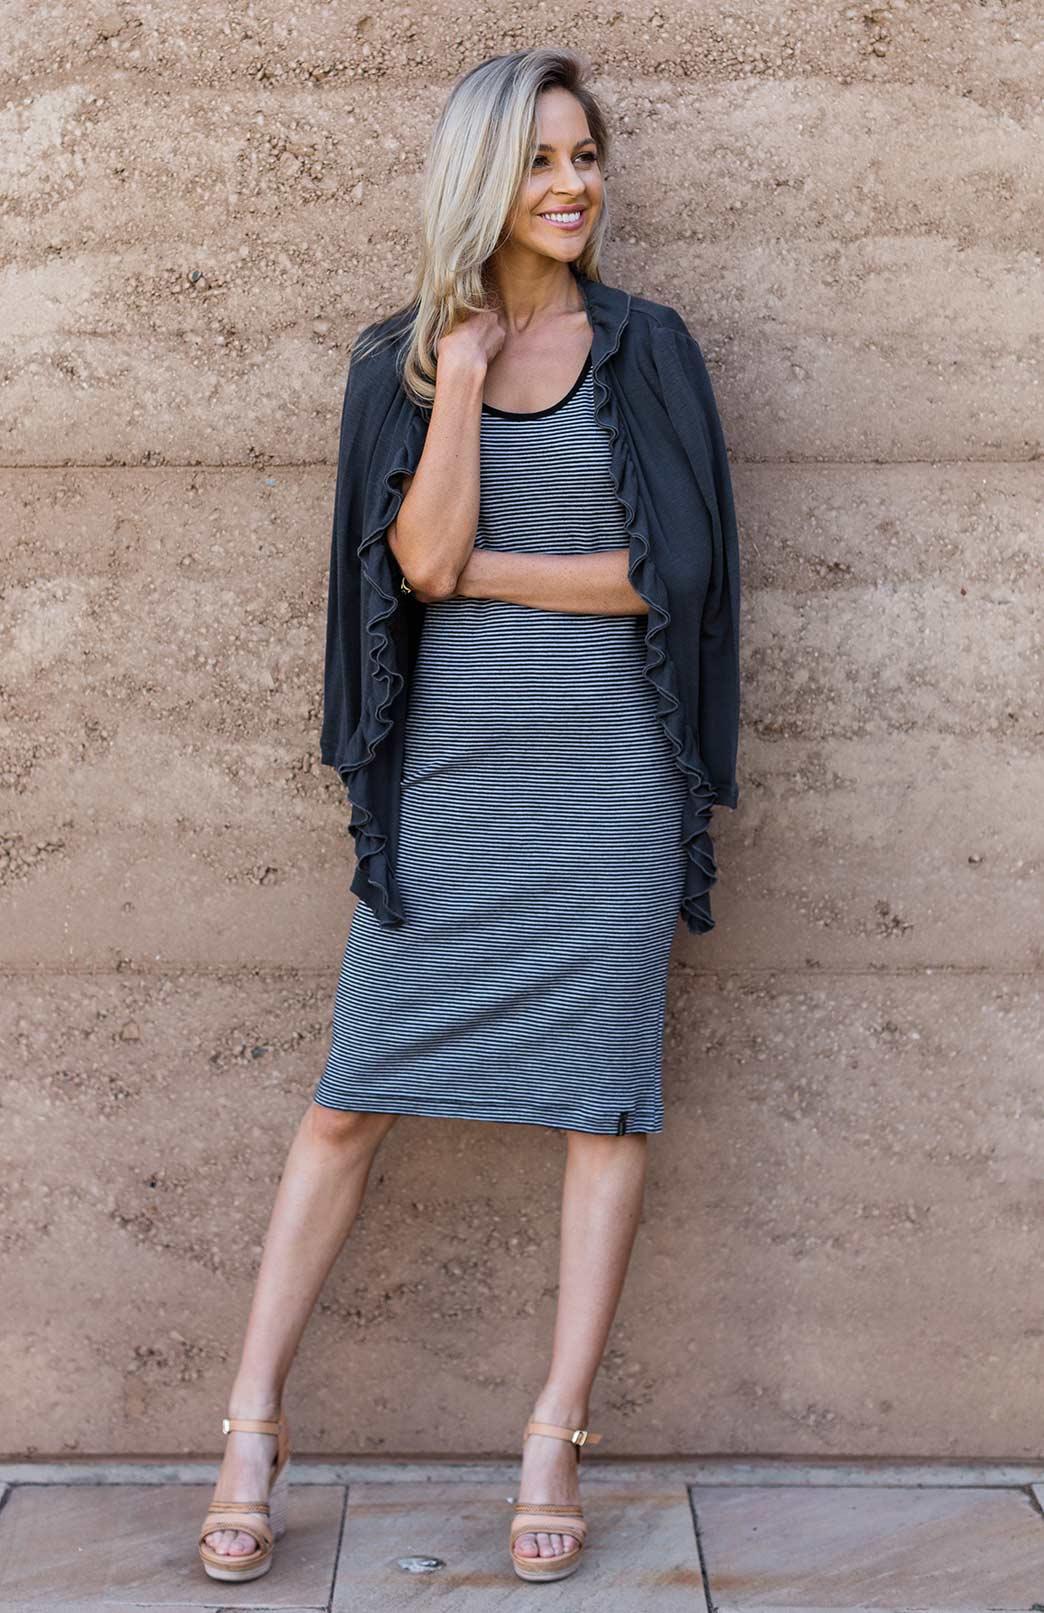 Lexi Dress - Women's Fine Striped Short Sleeve Scoop Neck Knee Length Summer Dress - Smitten Merino Tasmania Australia